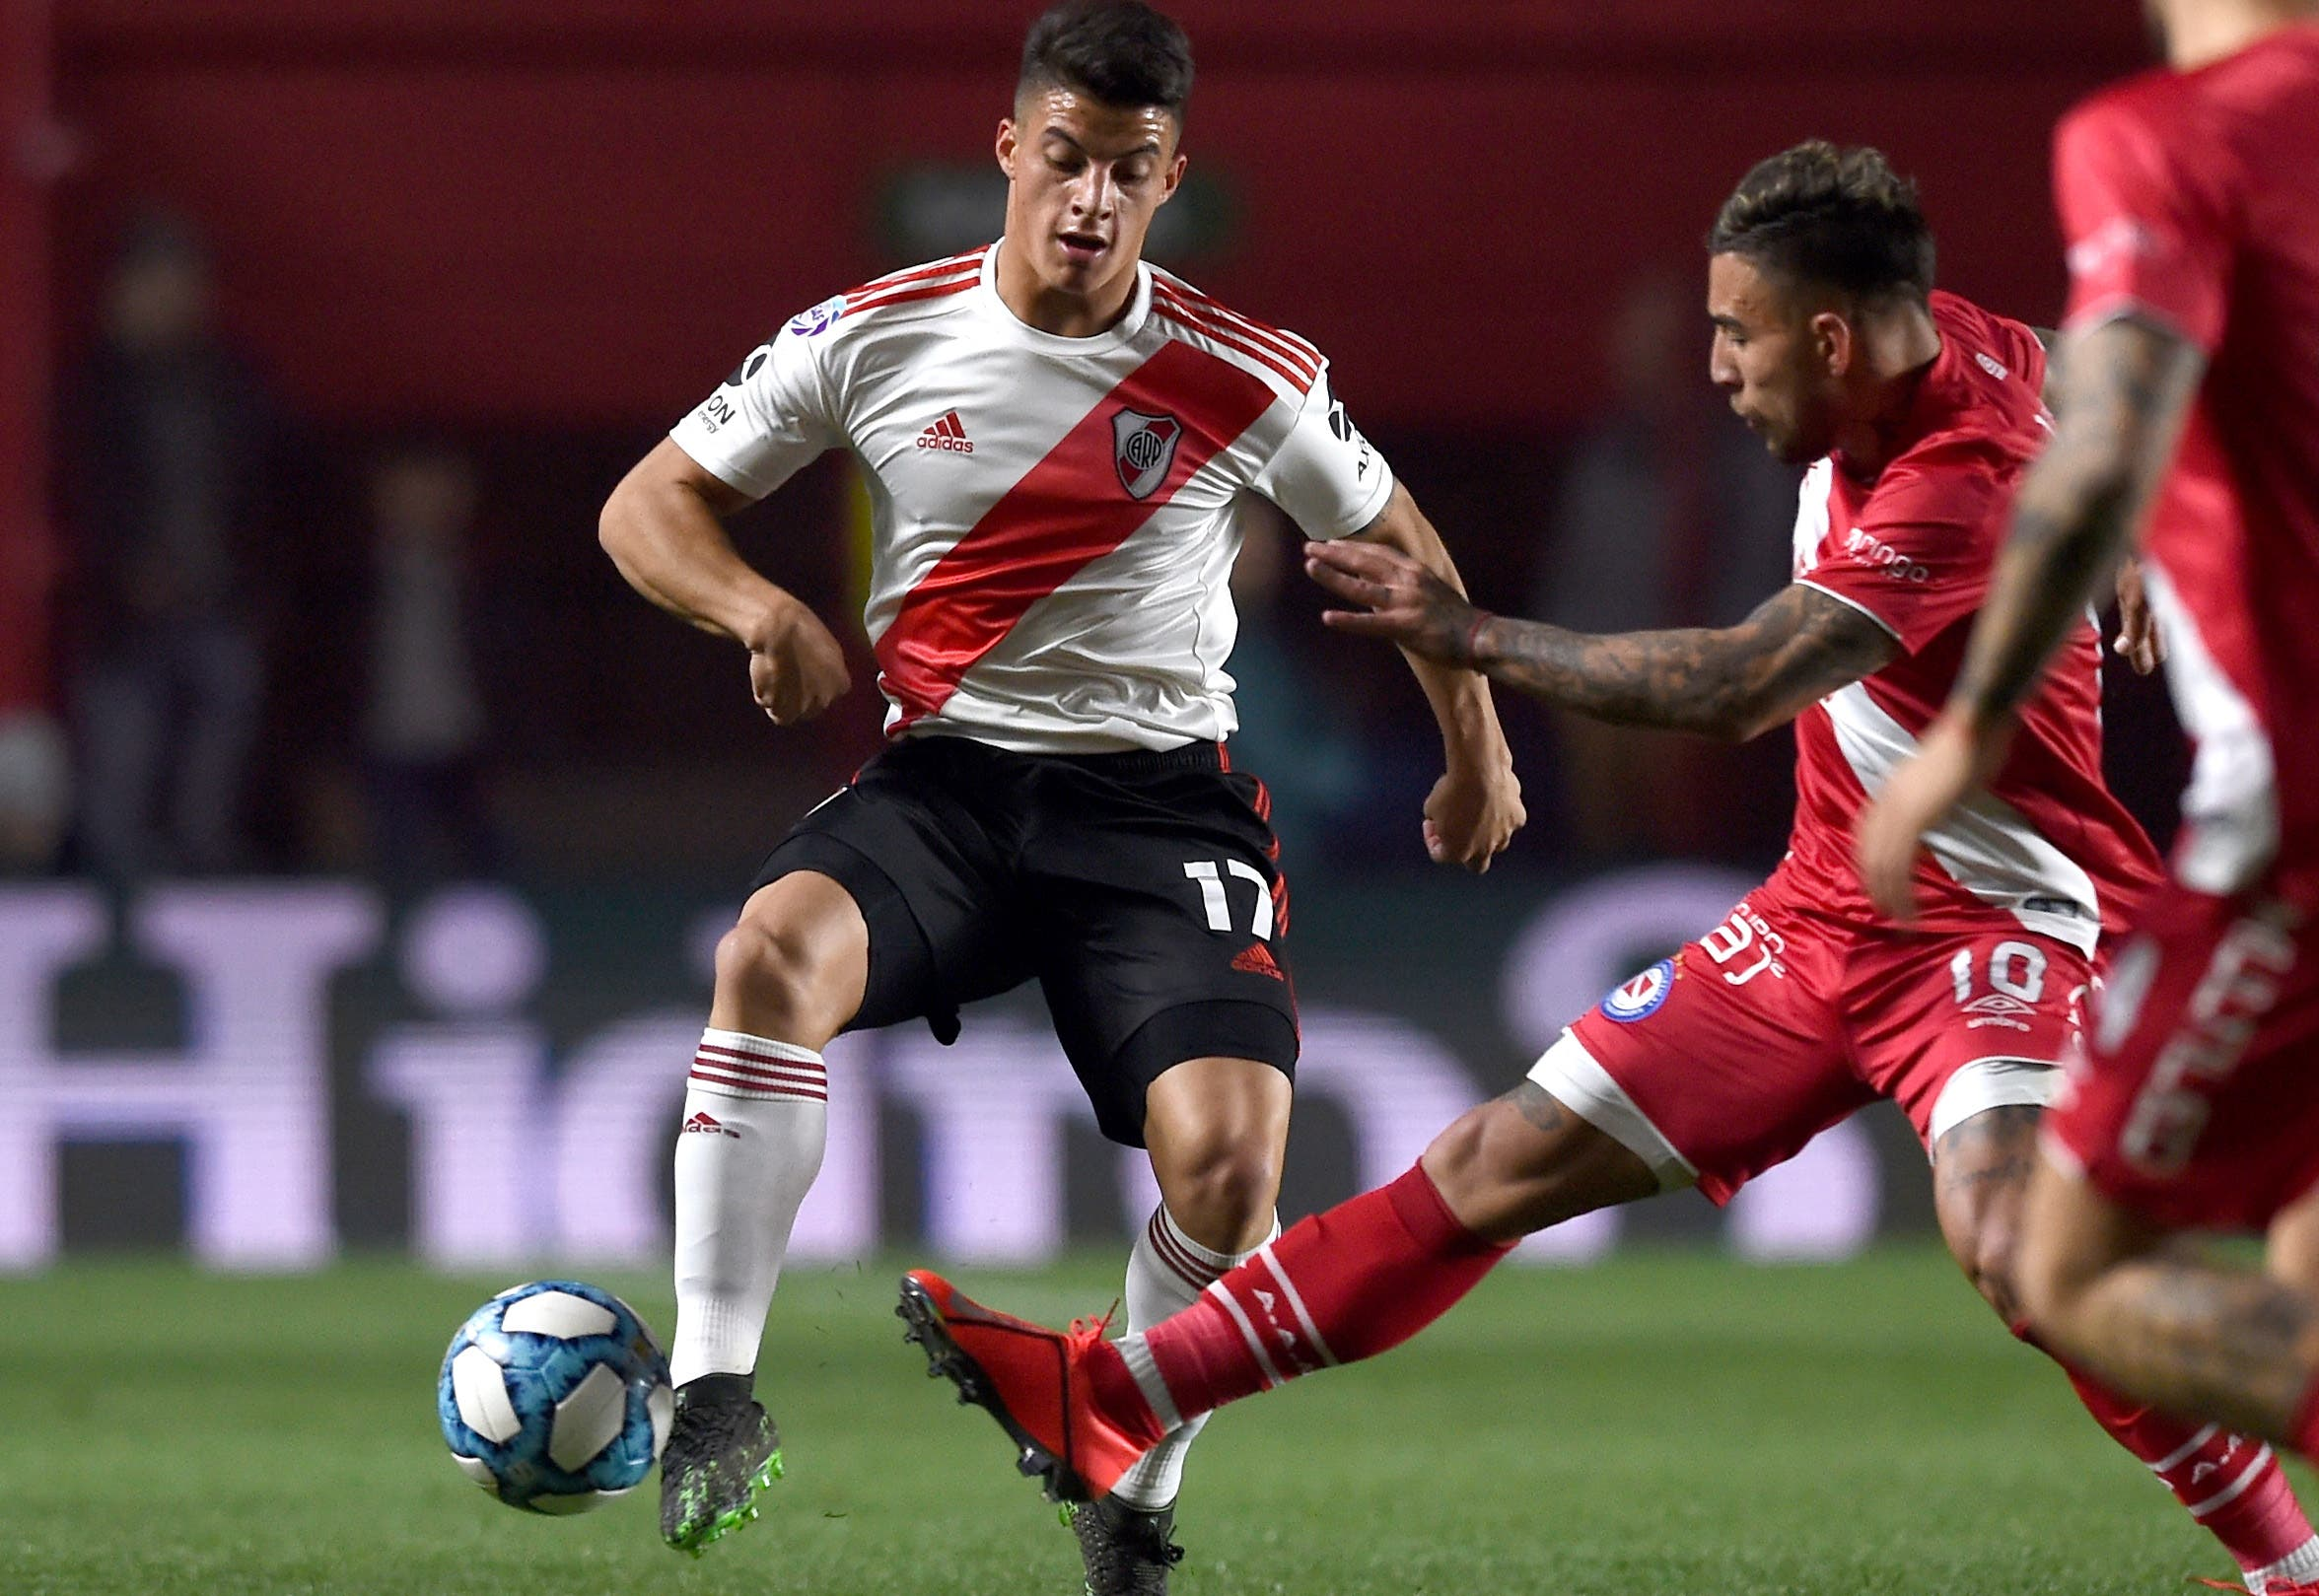 Argentinos le gana a River en La Paternal por un remate de Batallini que se desvió en Suárez